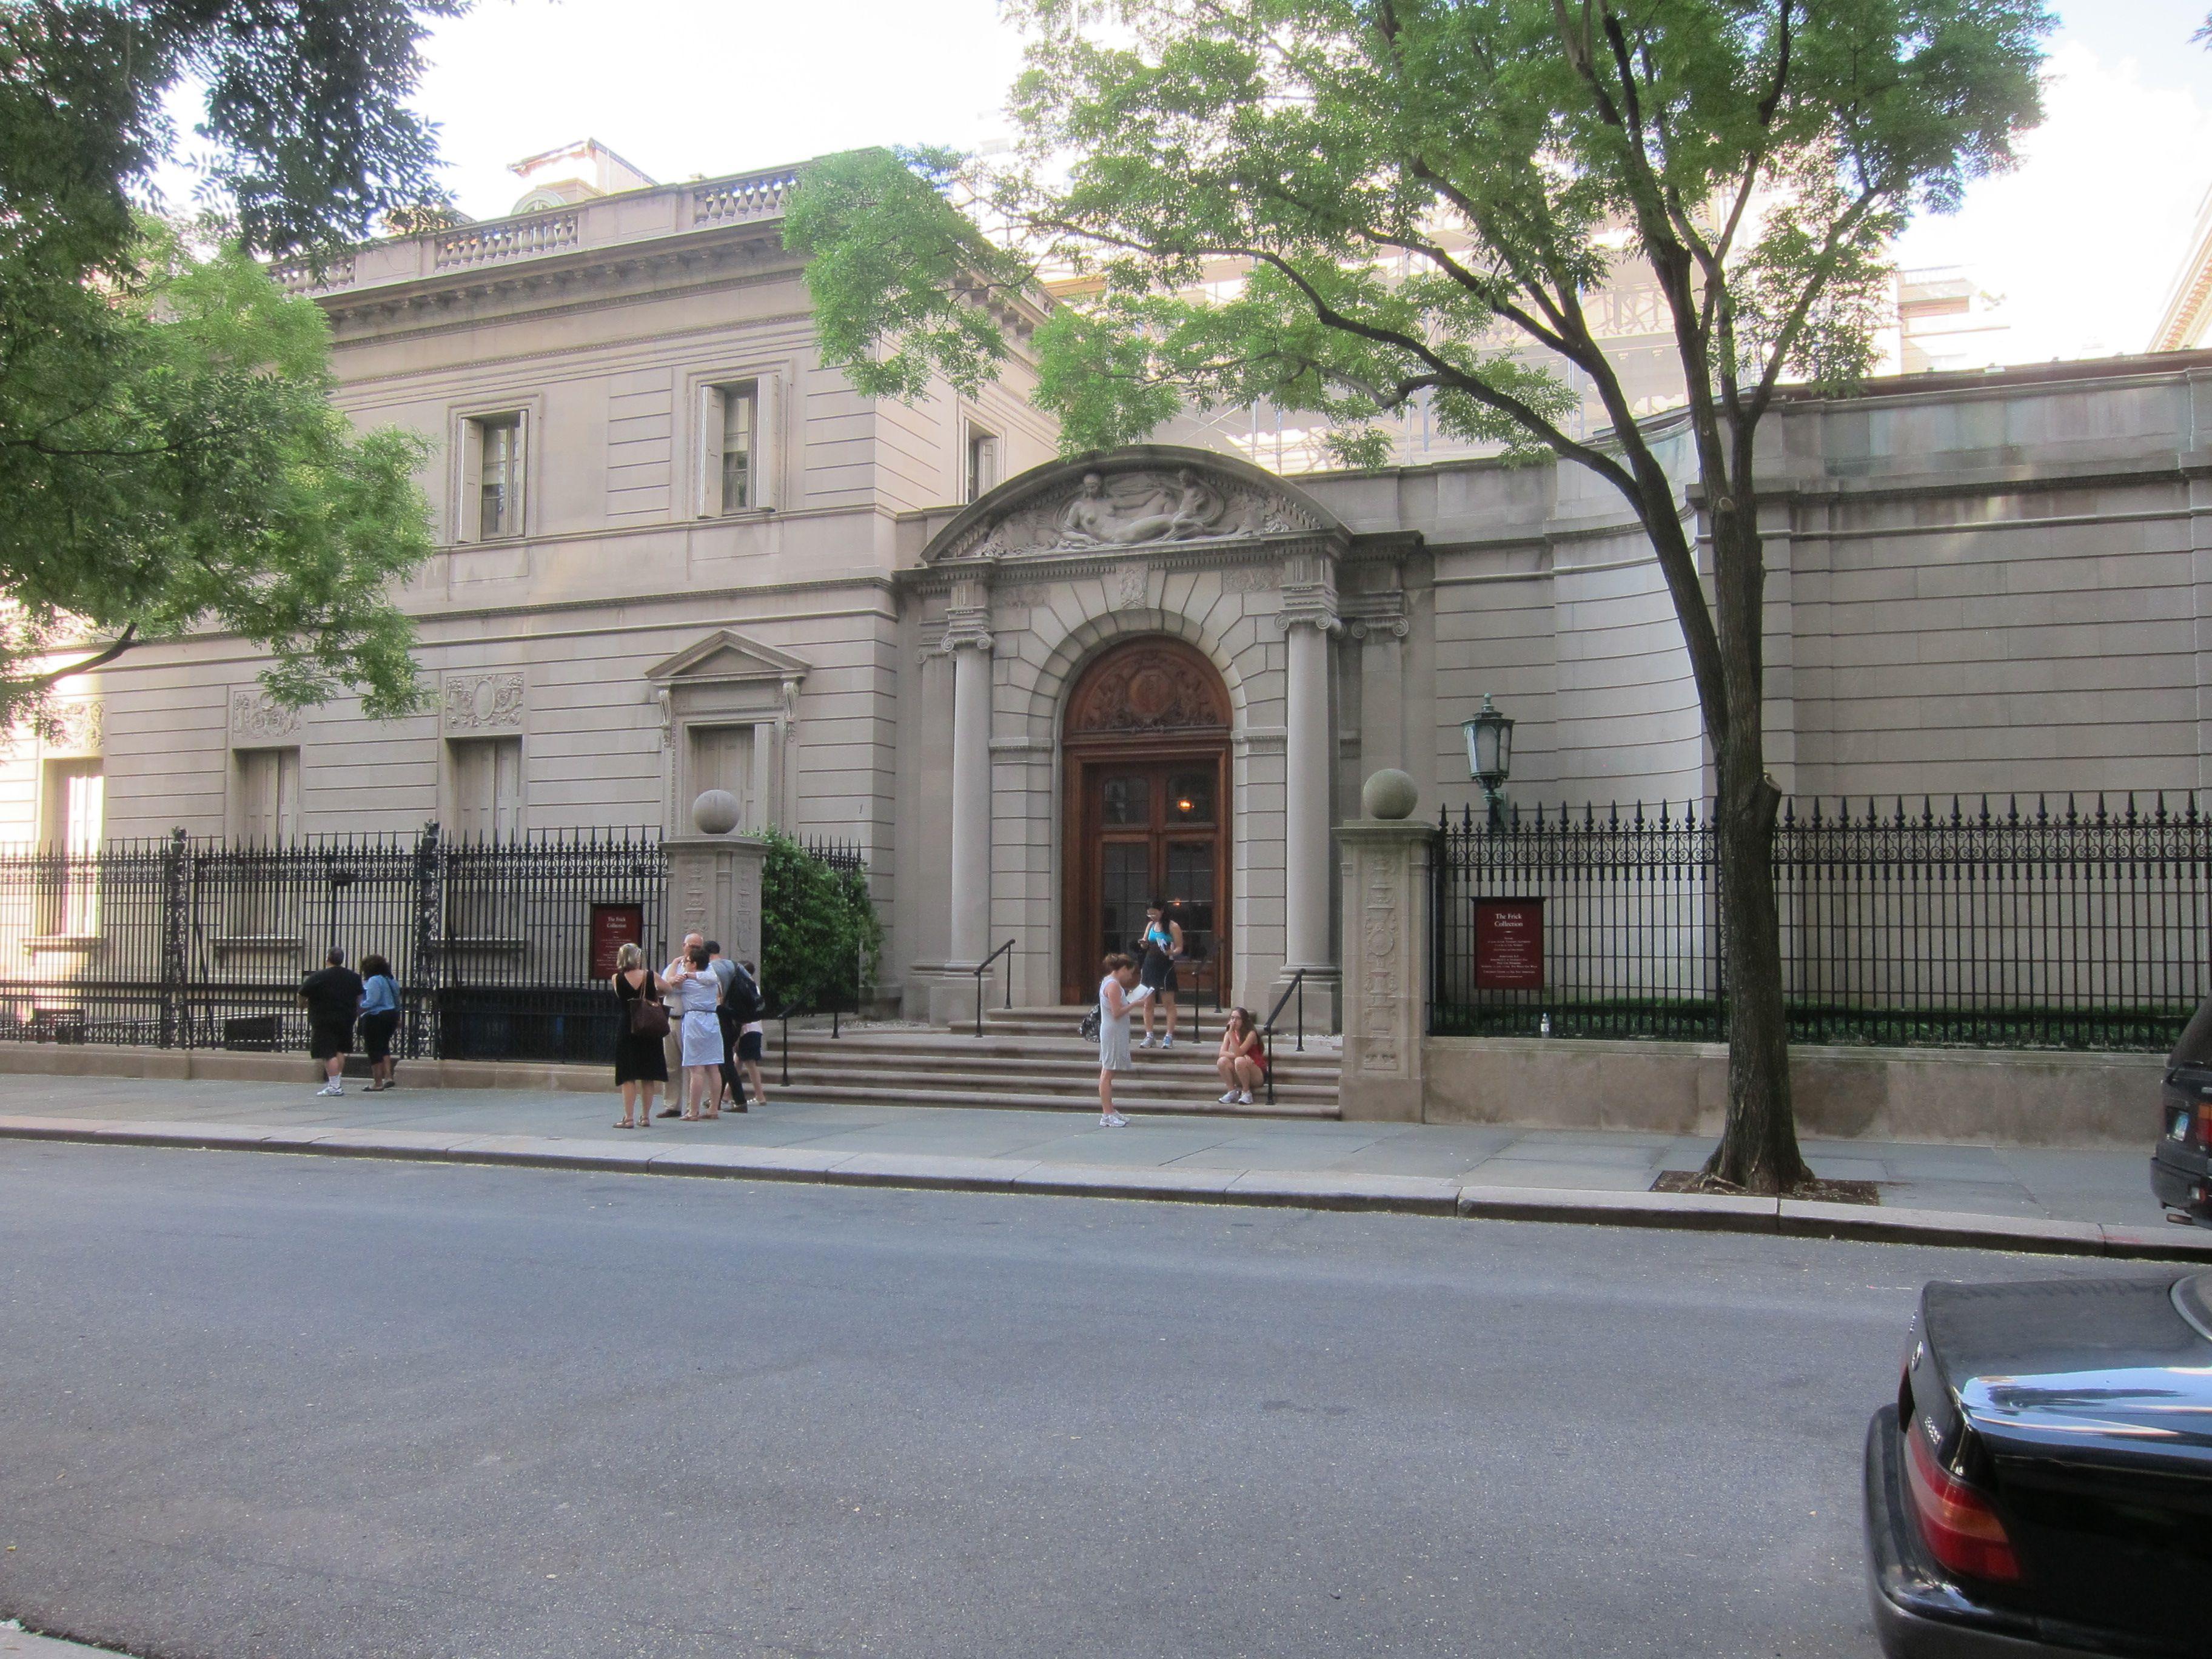 The Frick Estate New York City